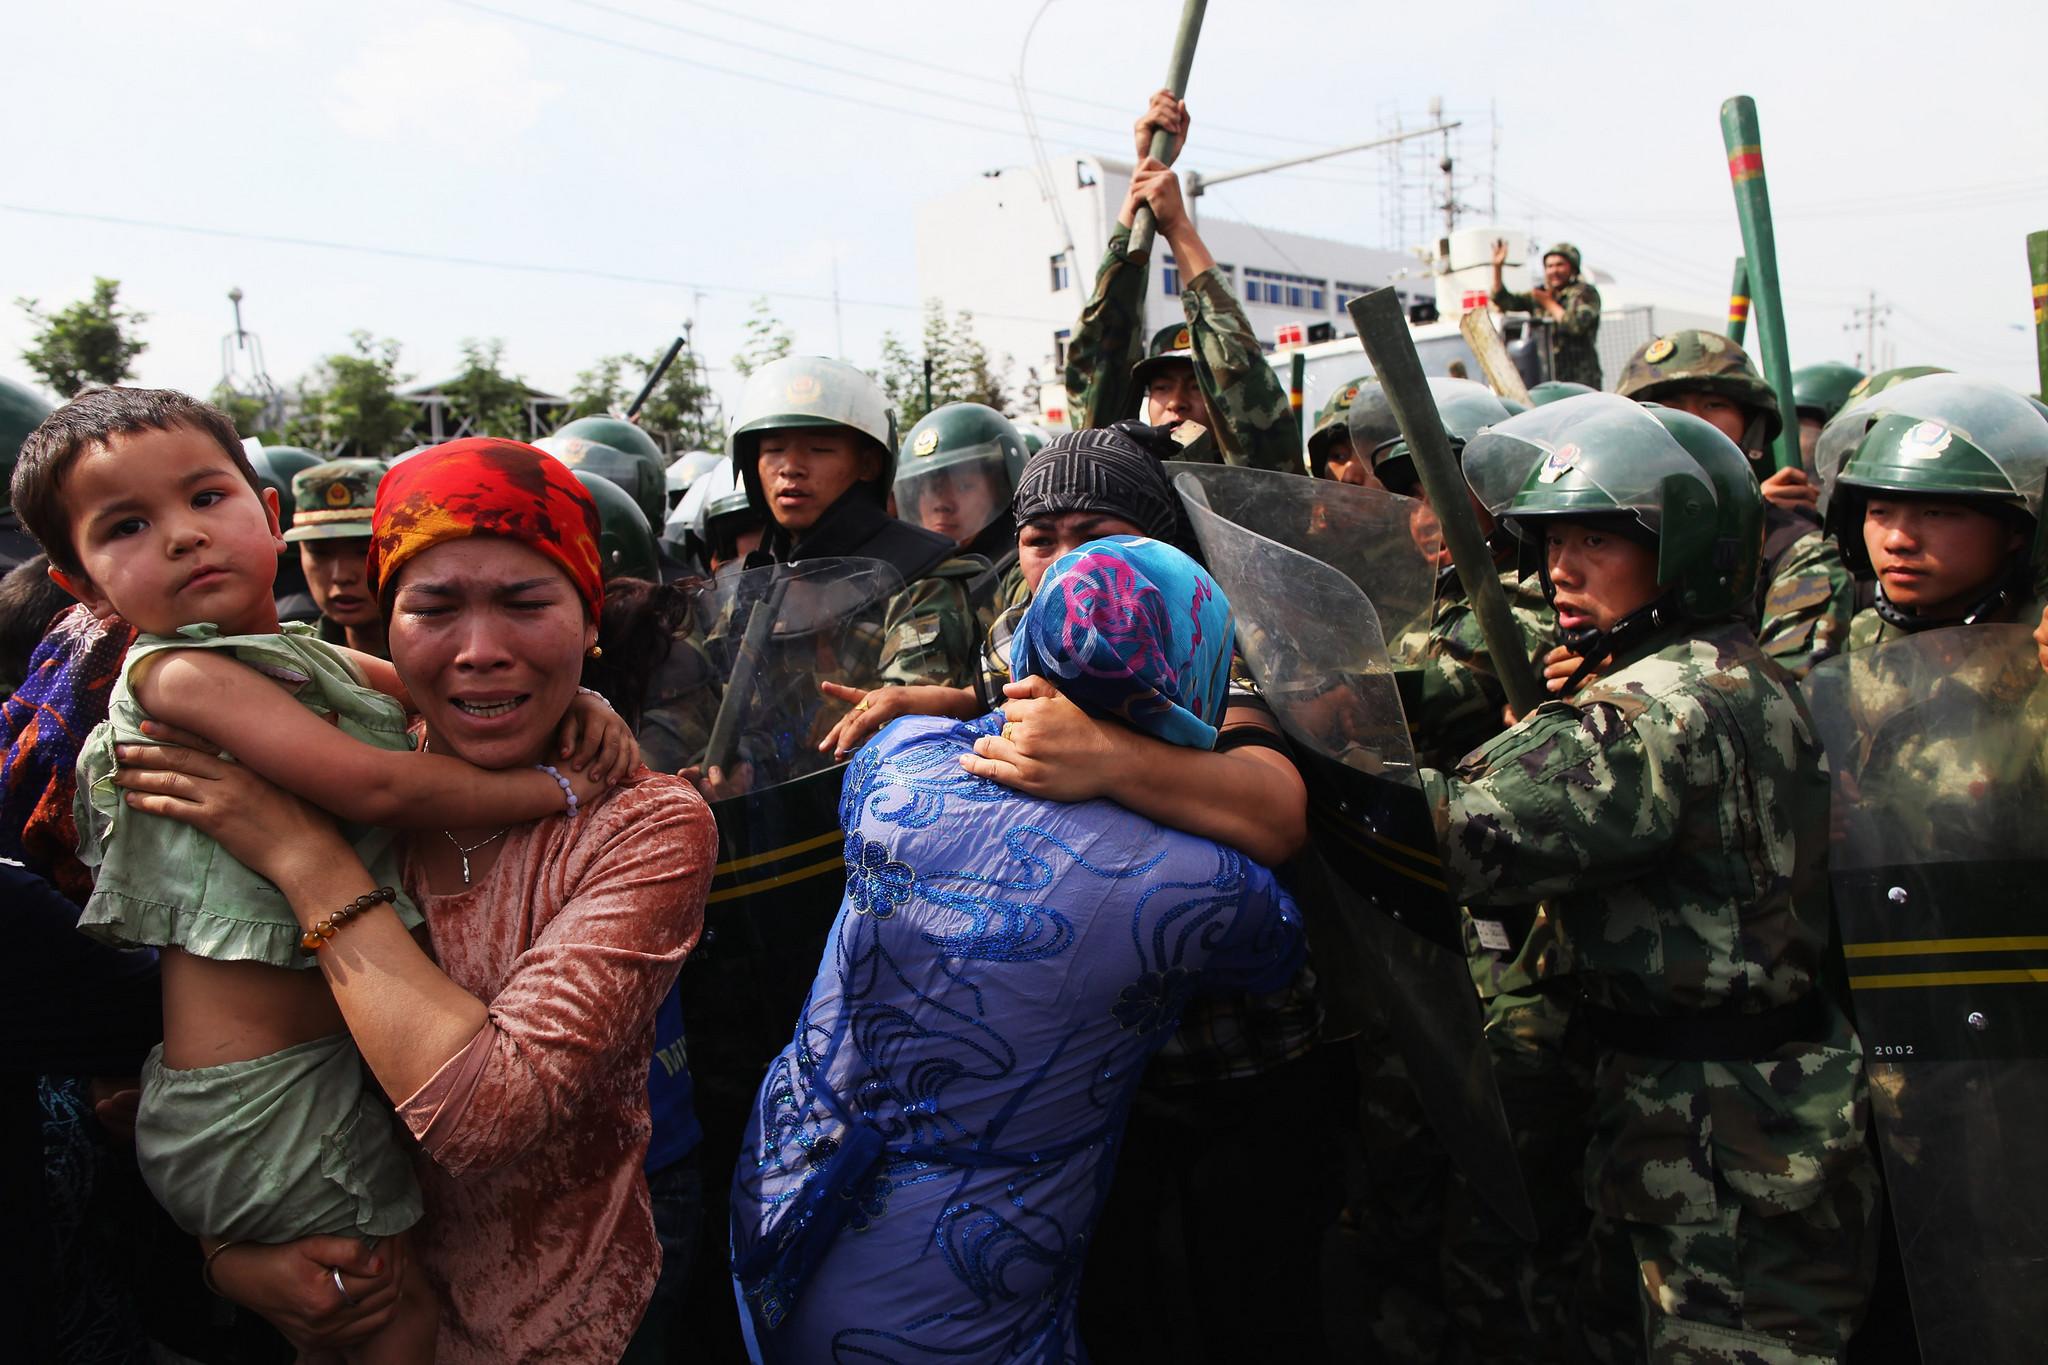 Uigures China Muçulmanos